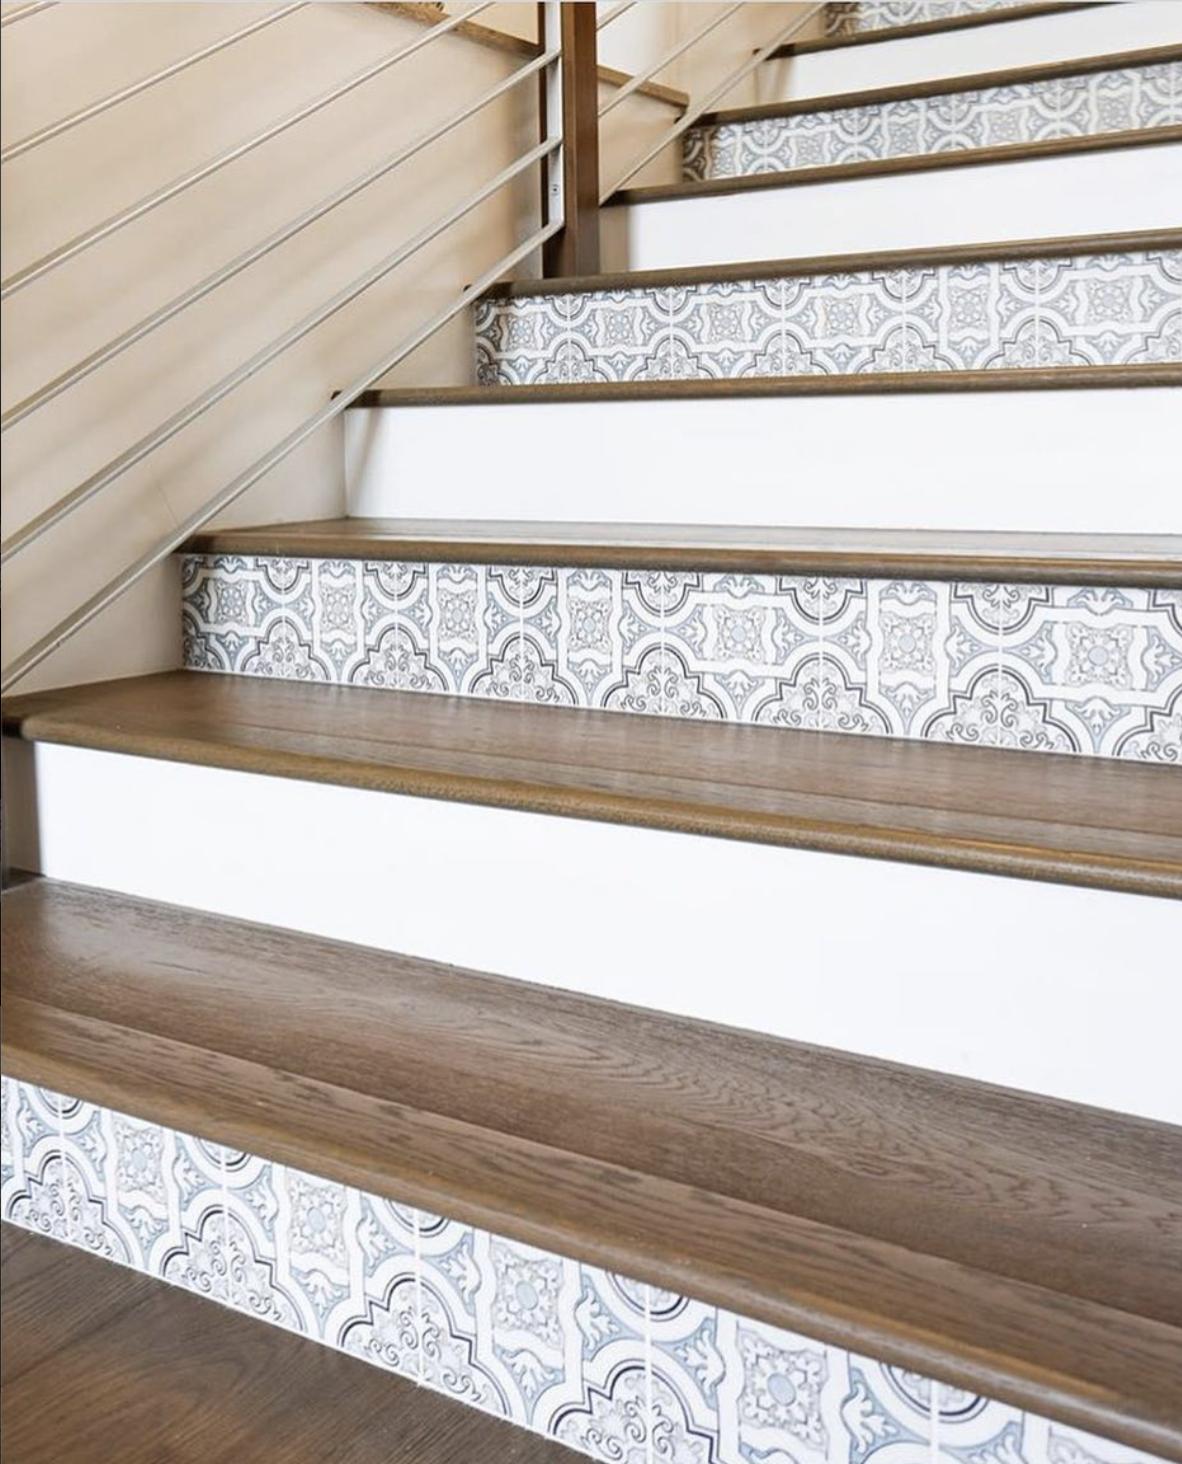 Best Tile Countertops Granite Remodeling More Tiled 400 x 300